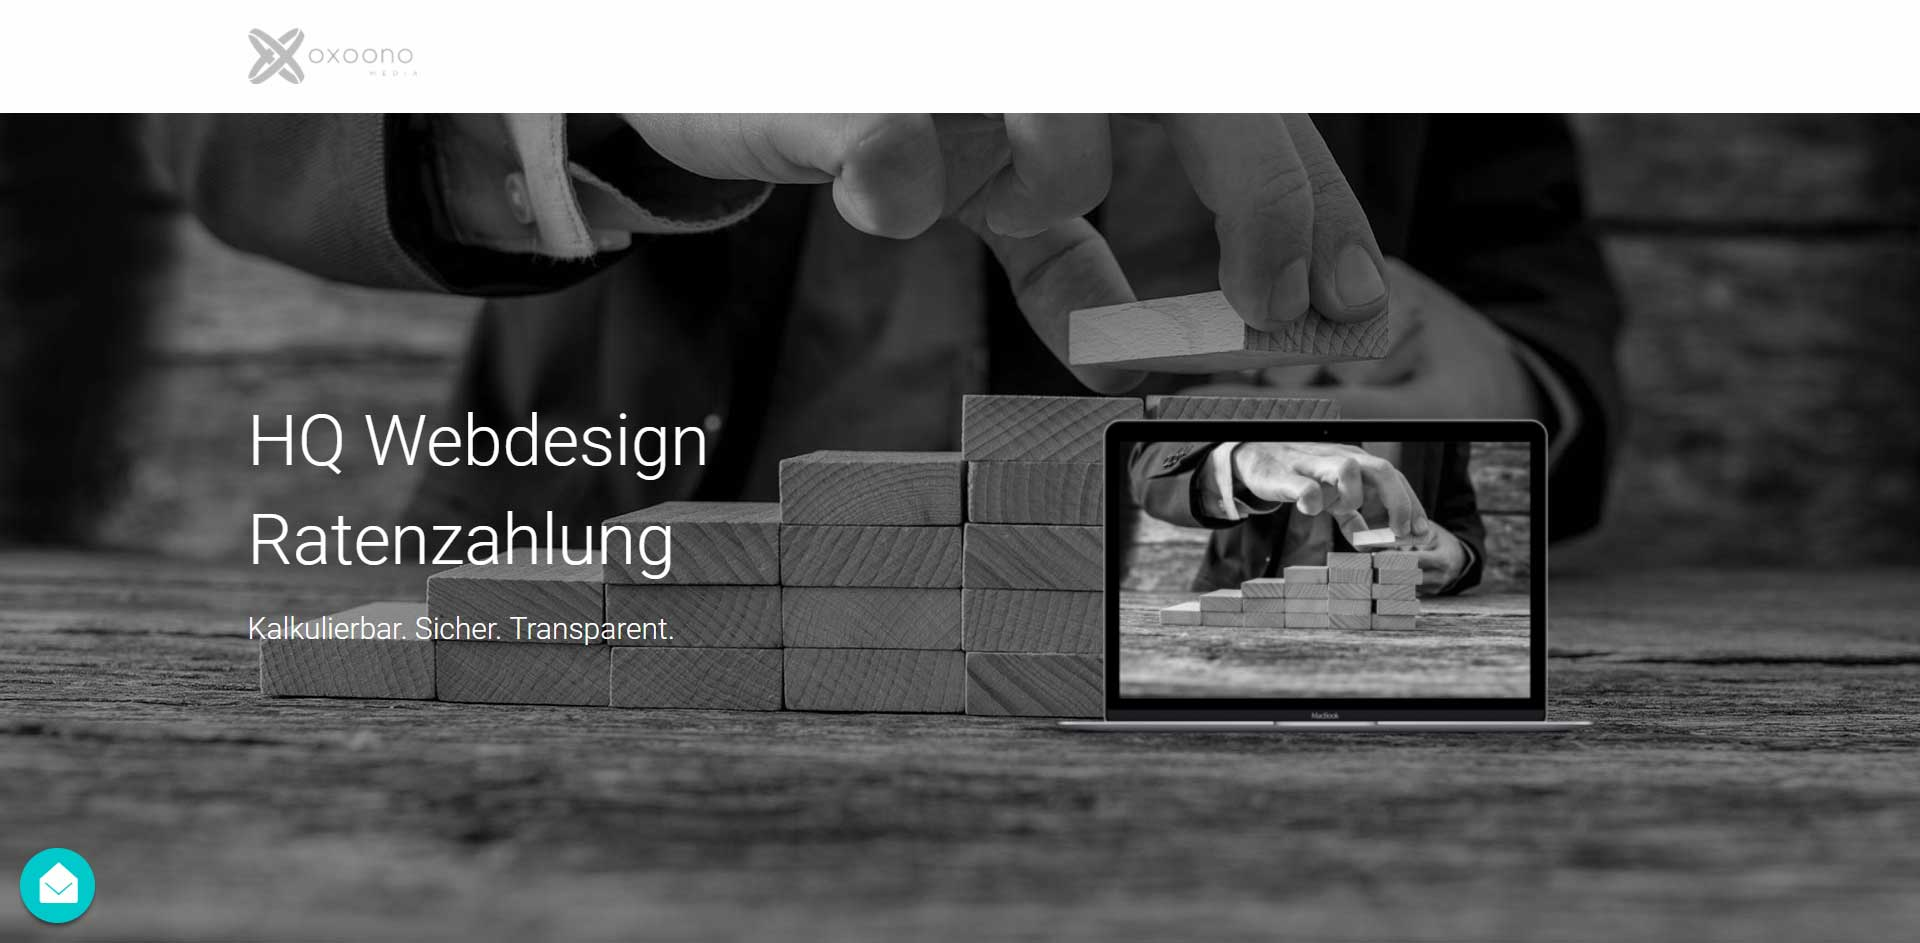 oxoono media portfolio website f r webdesign ratenzahlung in ibbenb ren. Black Bedroom Furniture Sets. Home Design Ideas